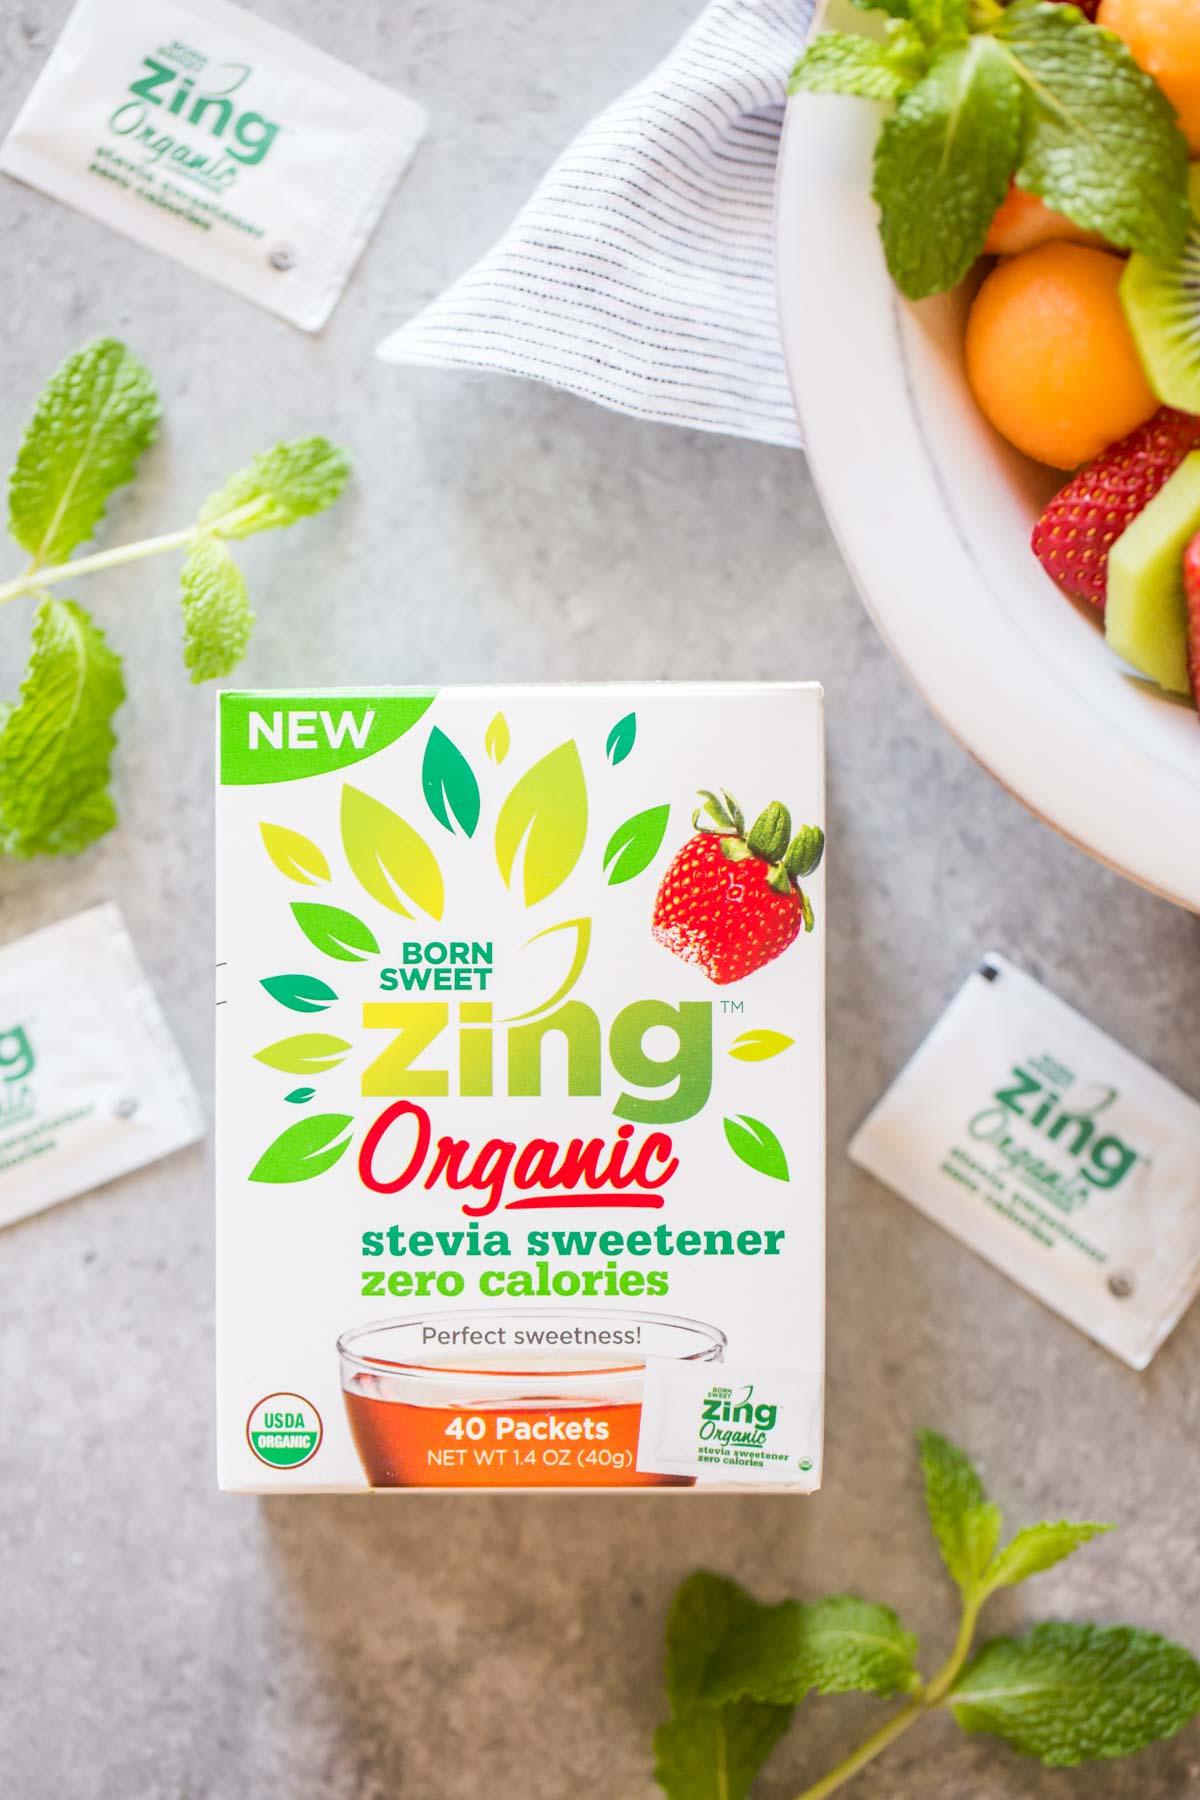 A box of Born Sweet Zing Organic Stevia Sweetener, sitting next to the bowl of Summer Fruit Salad.